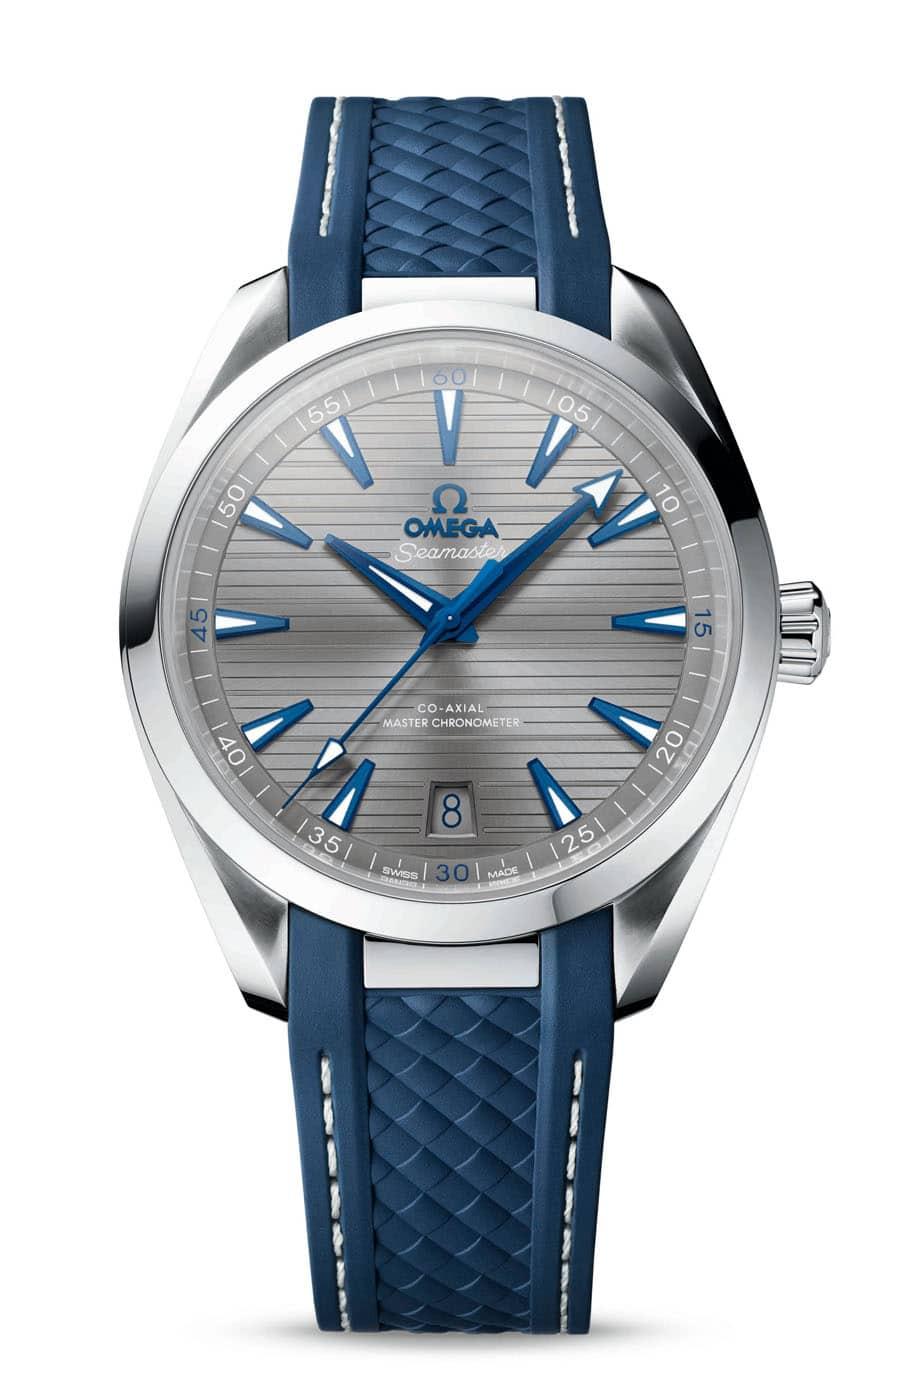 Platz 10 der beliebtesten Uhrenmodelle 2017: Omega Seamaster Aqua Terra